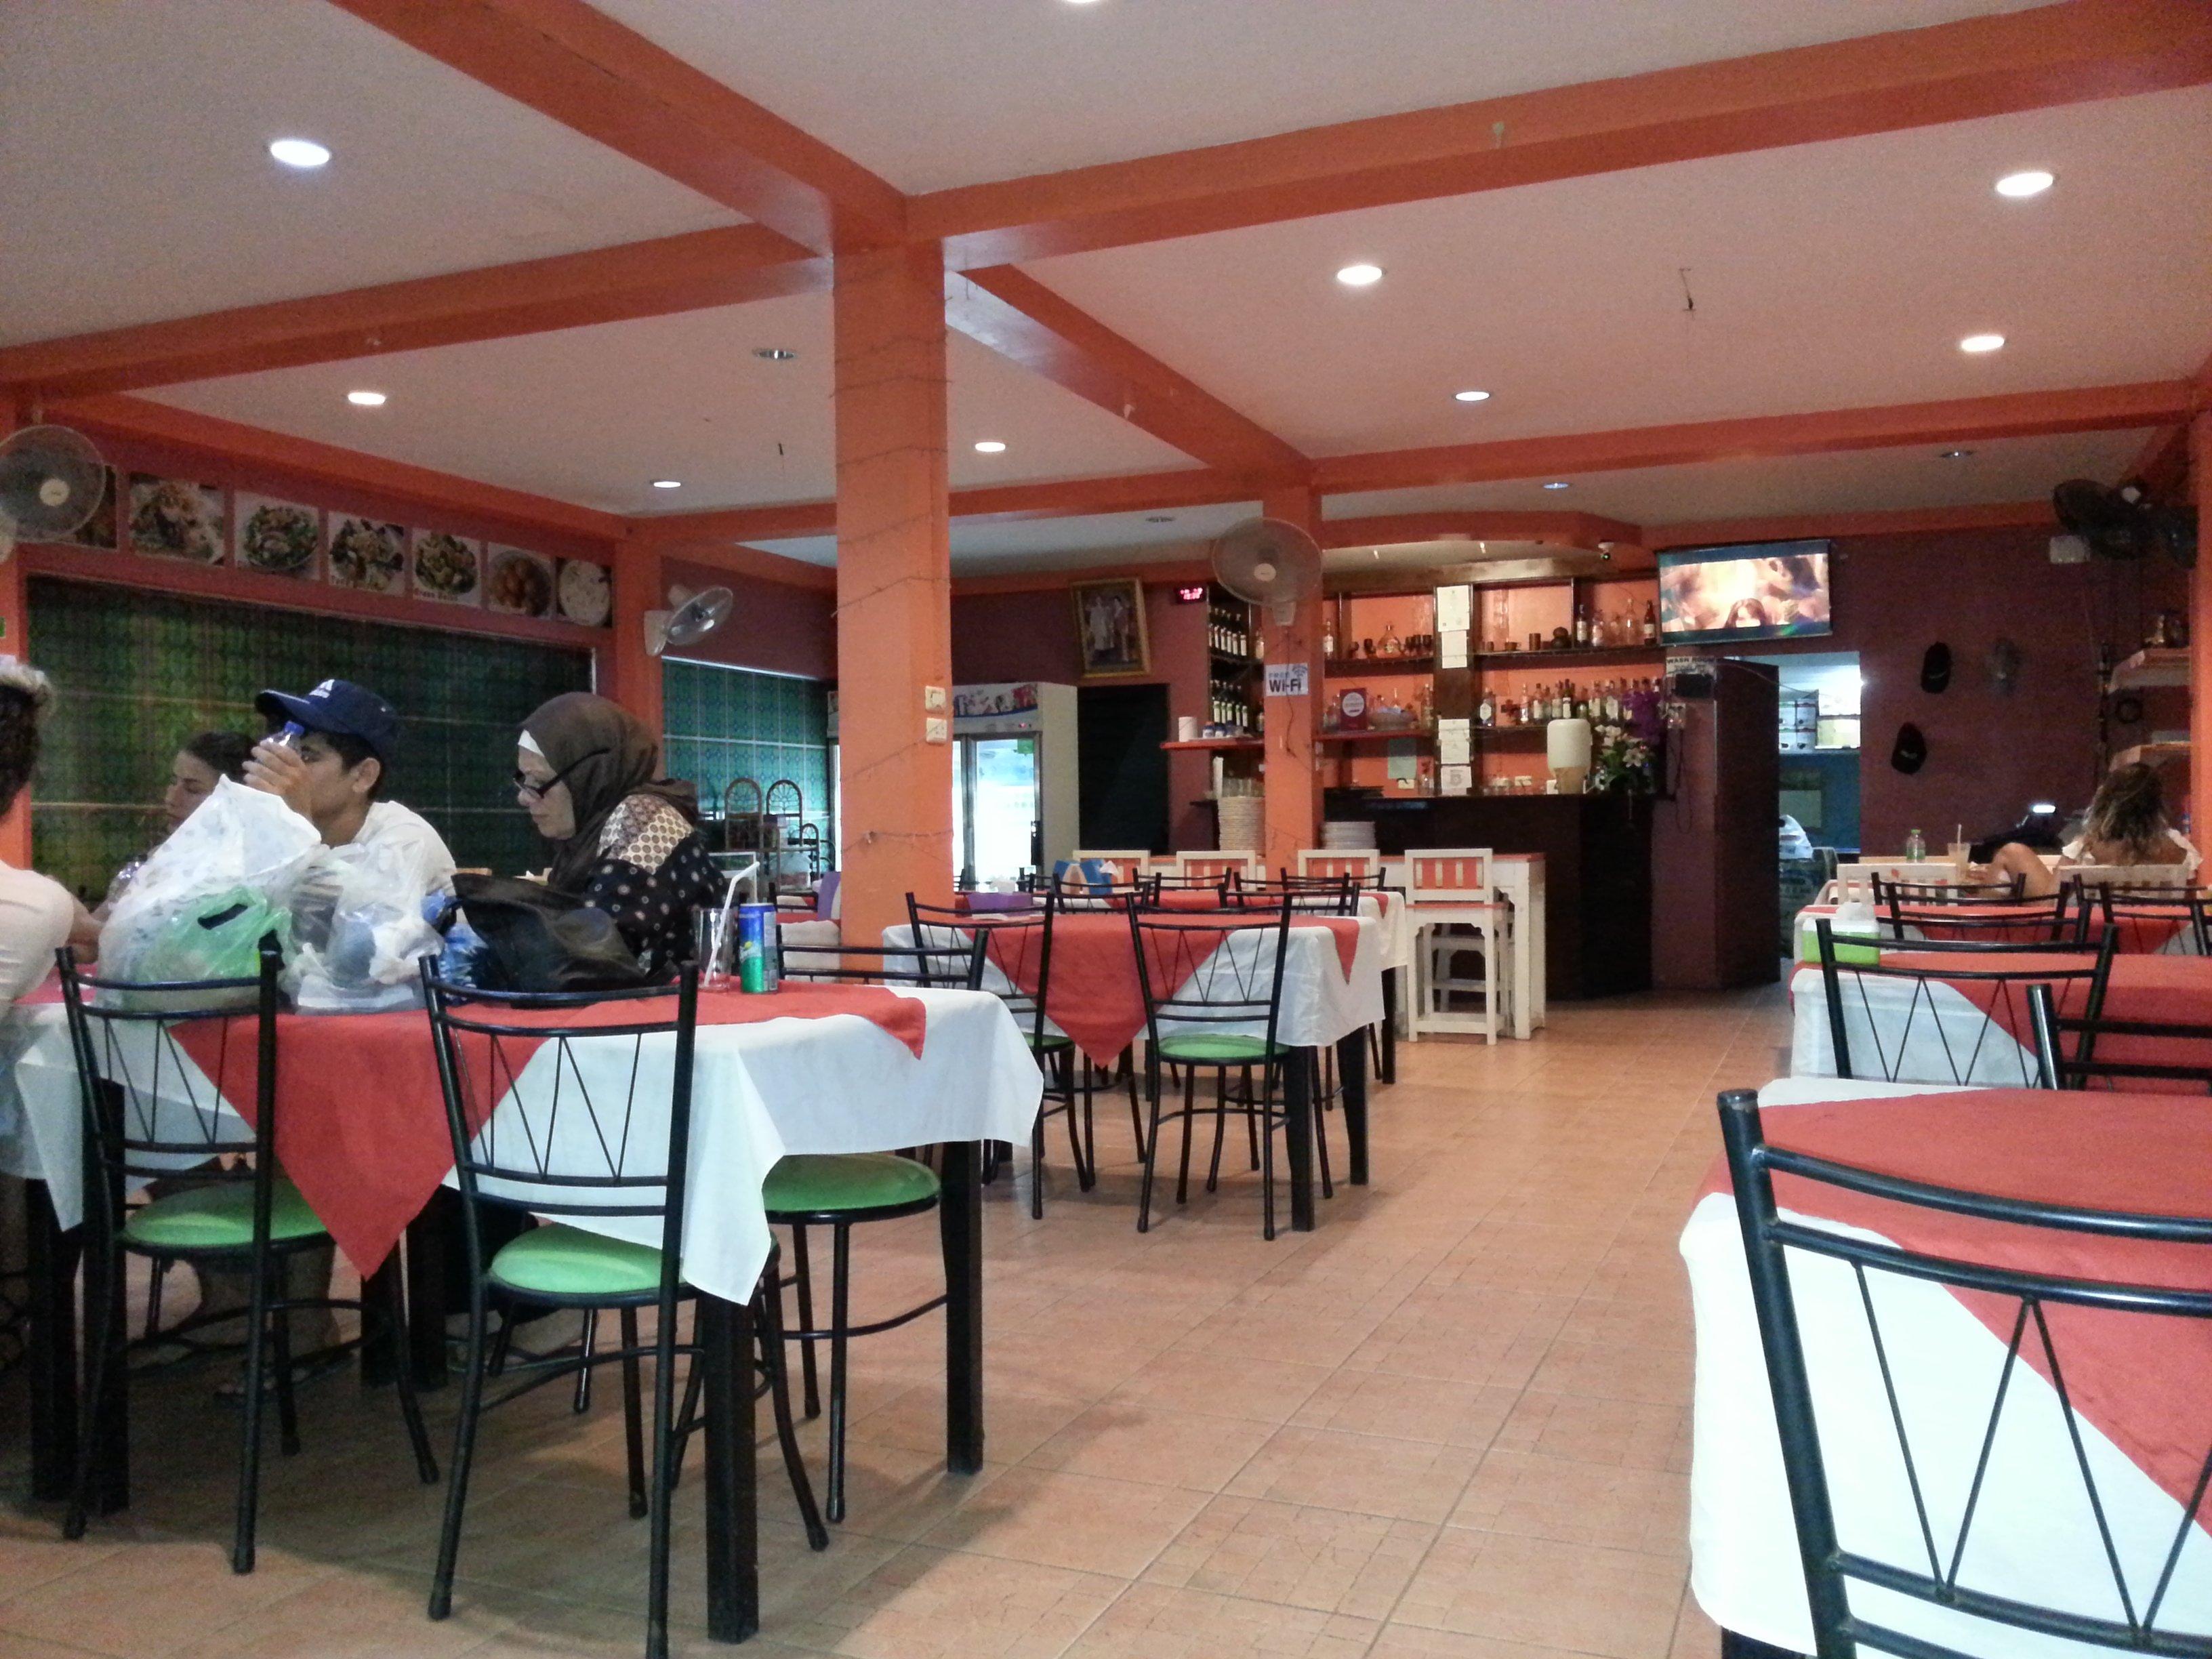 Inside the Maharaja Restaurant